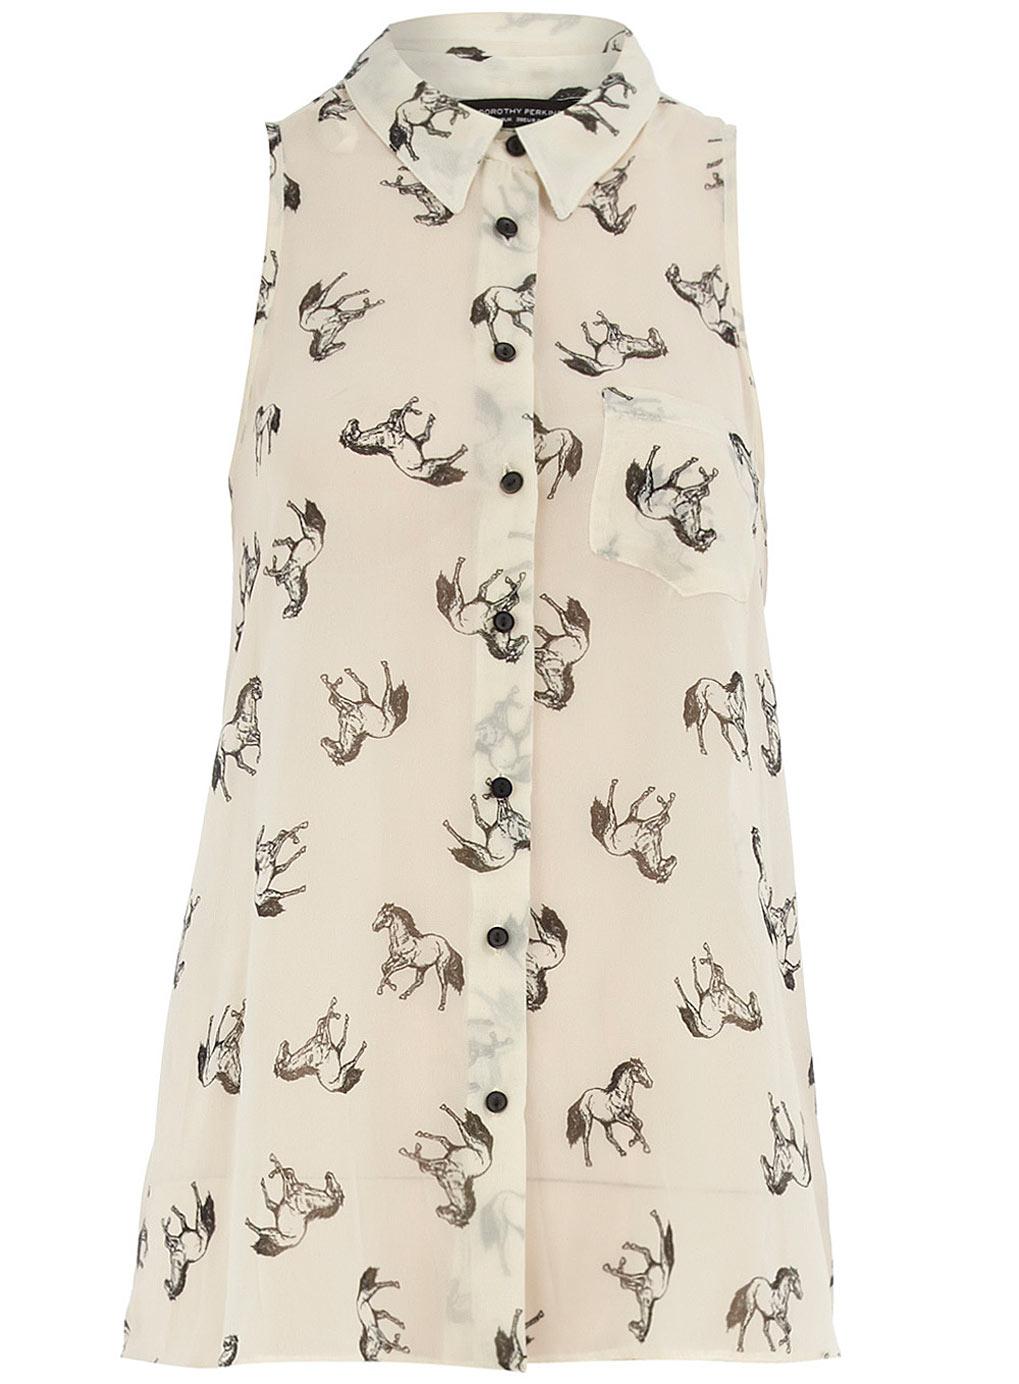 Horse Print Blouse Zara 39